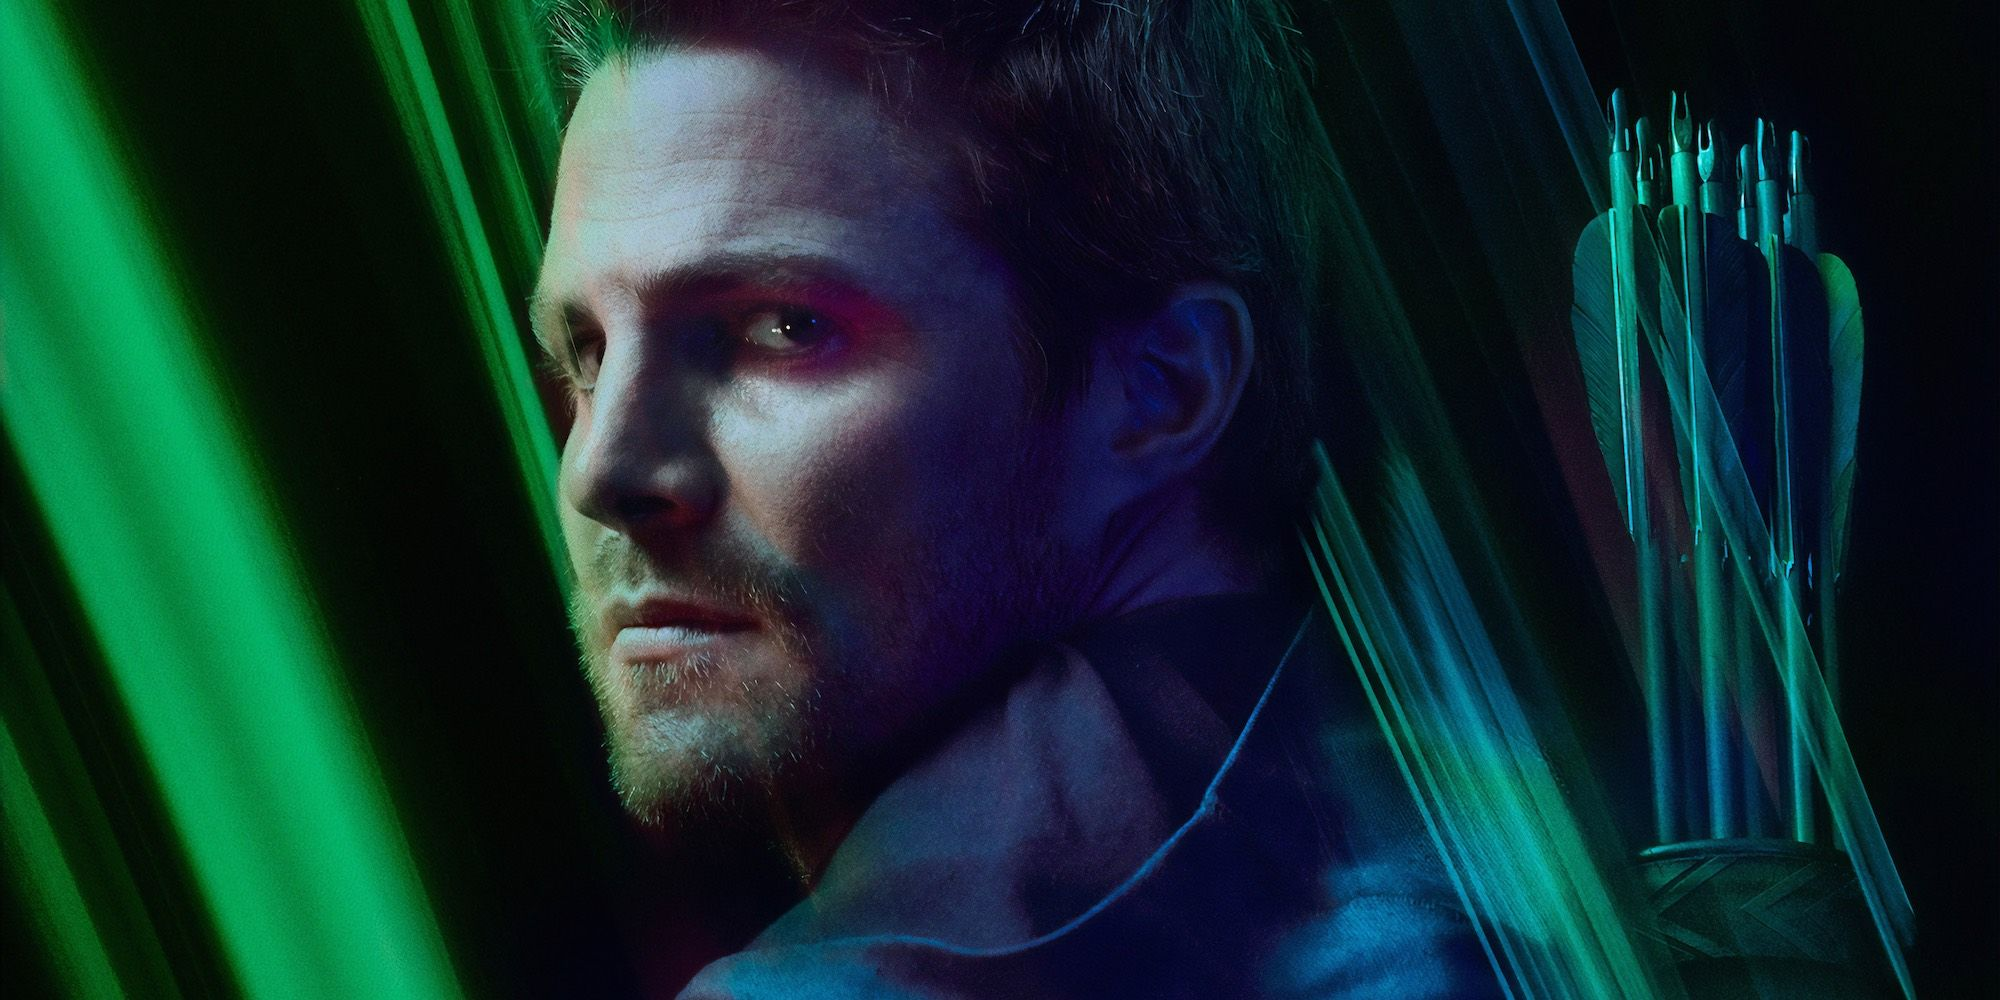 Arrow Series Finale Trailer Promises An Emotional Ending